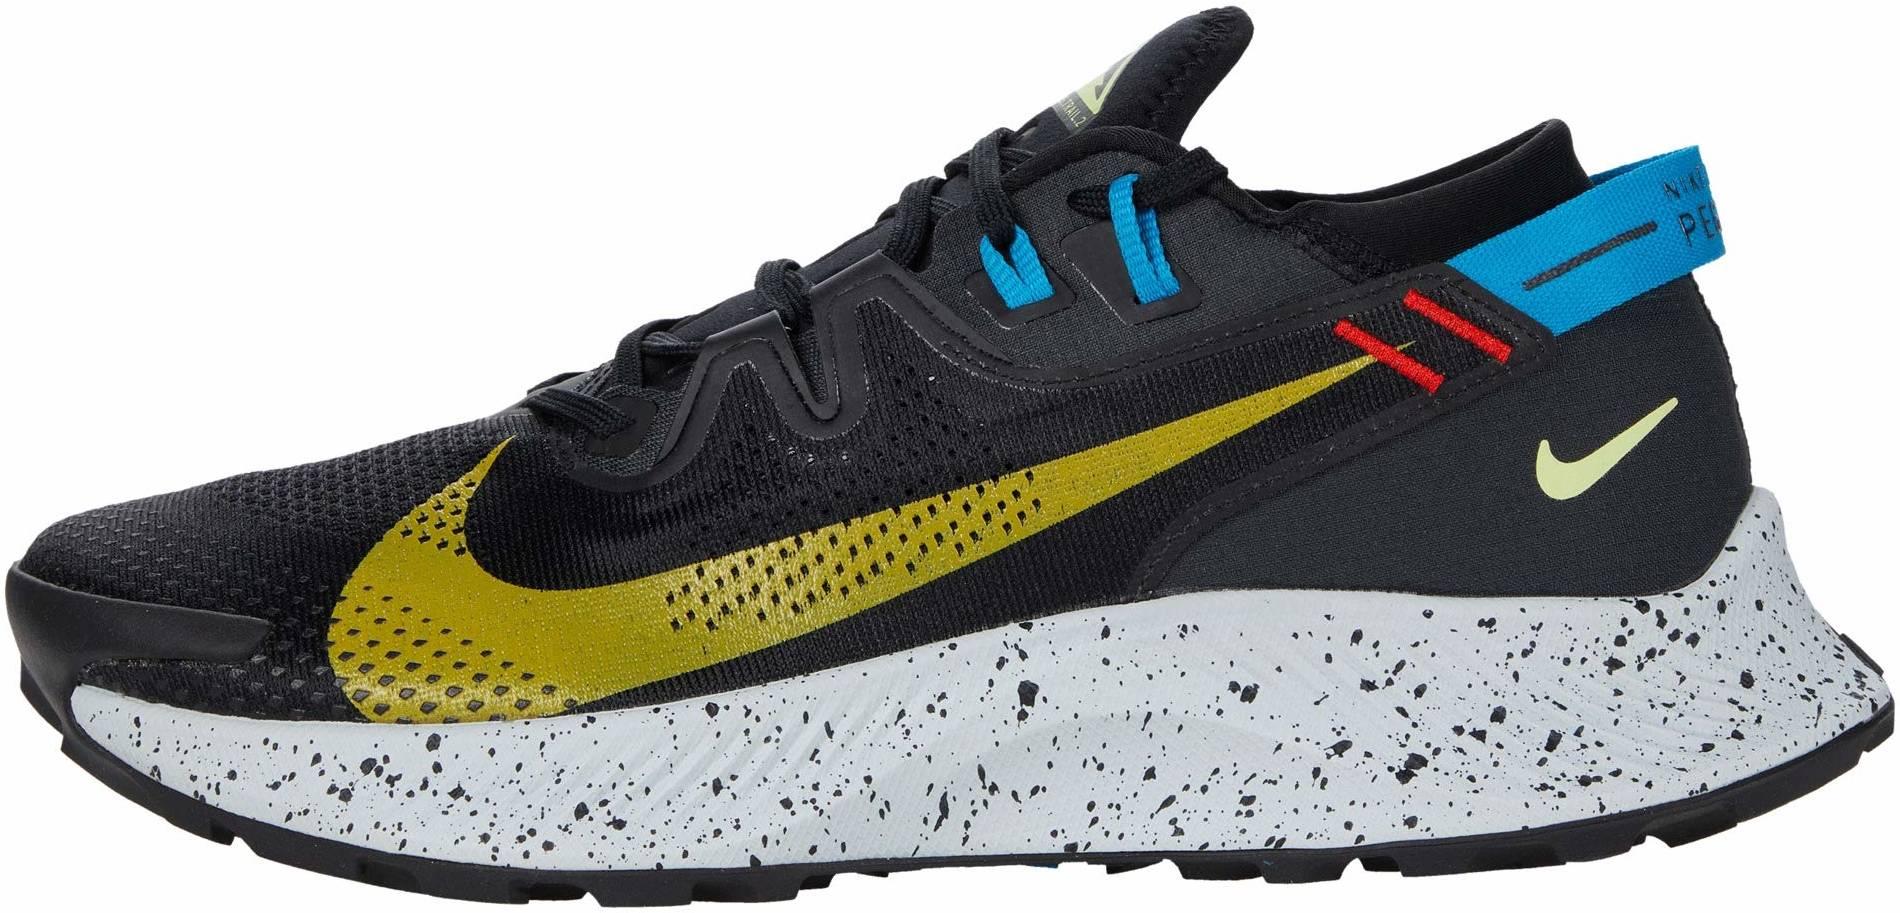 Nike Pegasus Trail 2 - Review 2021 - Facts, Deals ($98) | RunRepeat